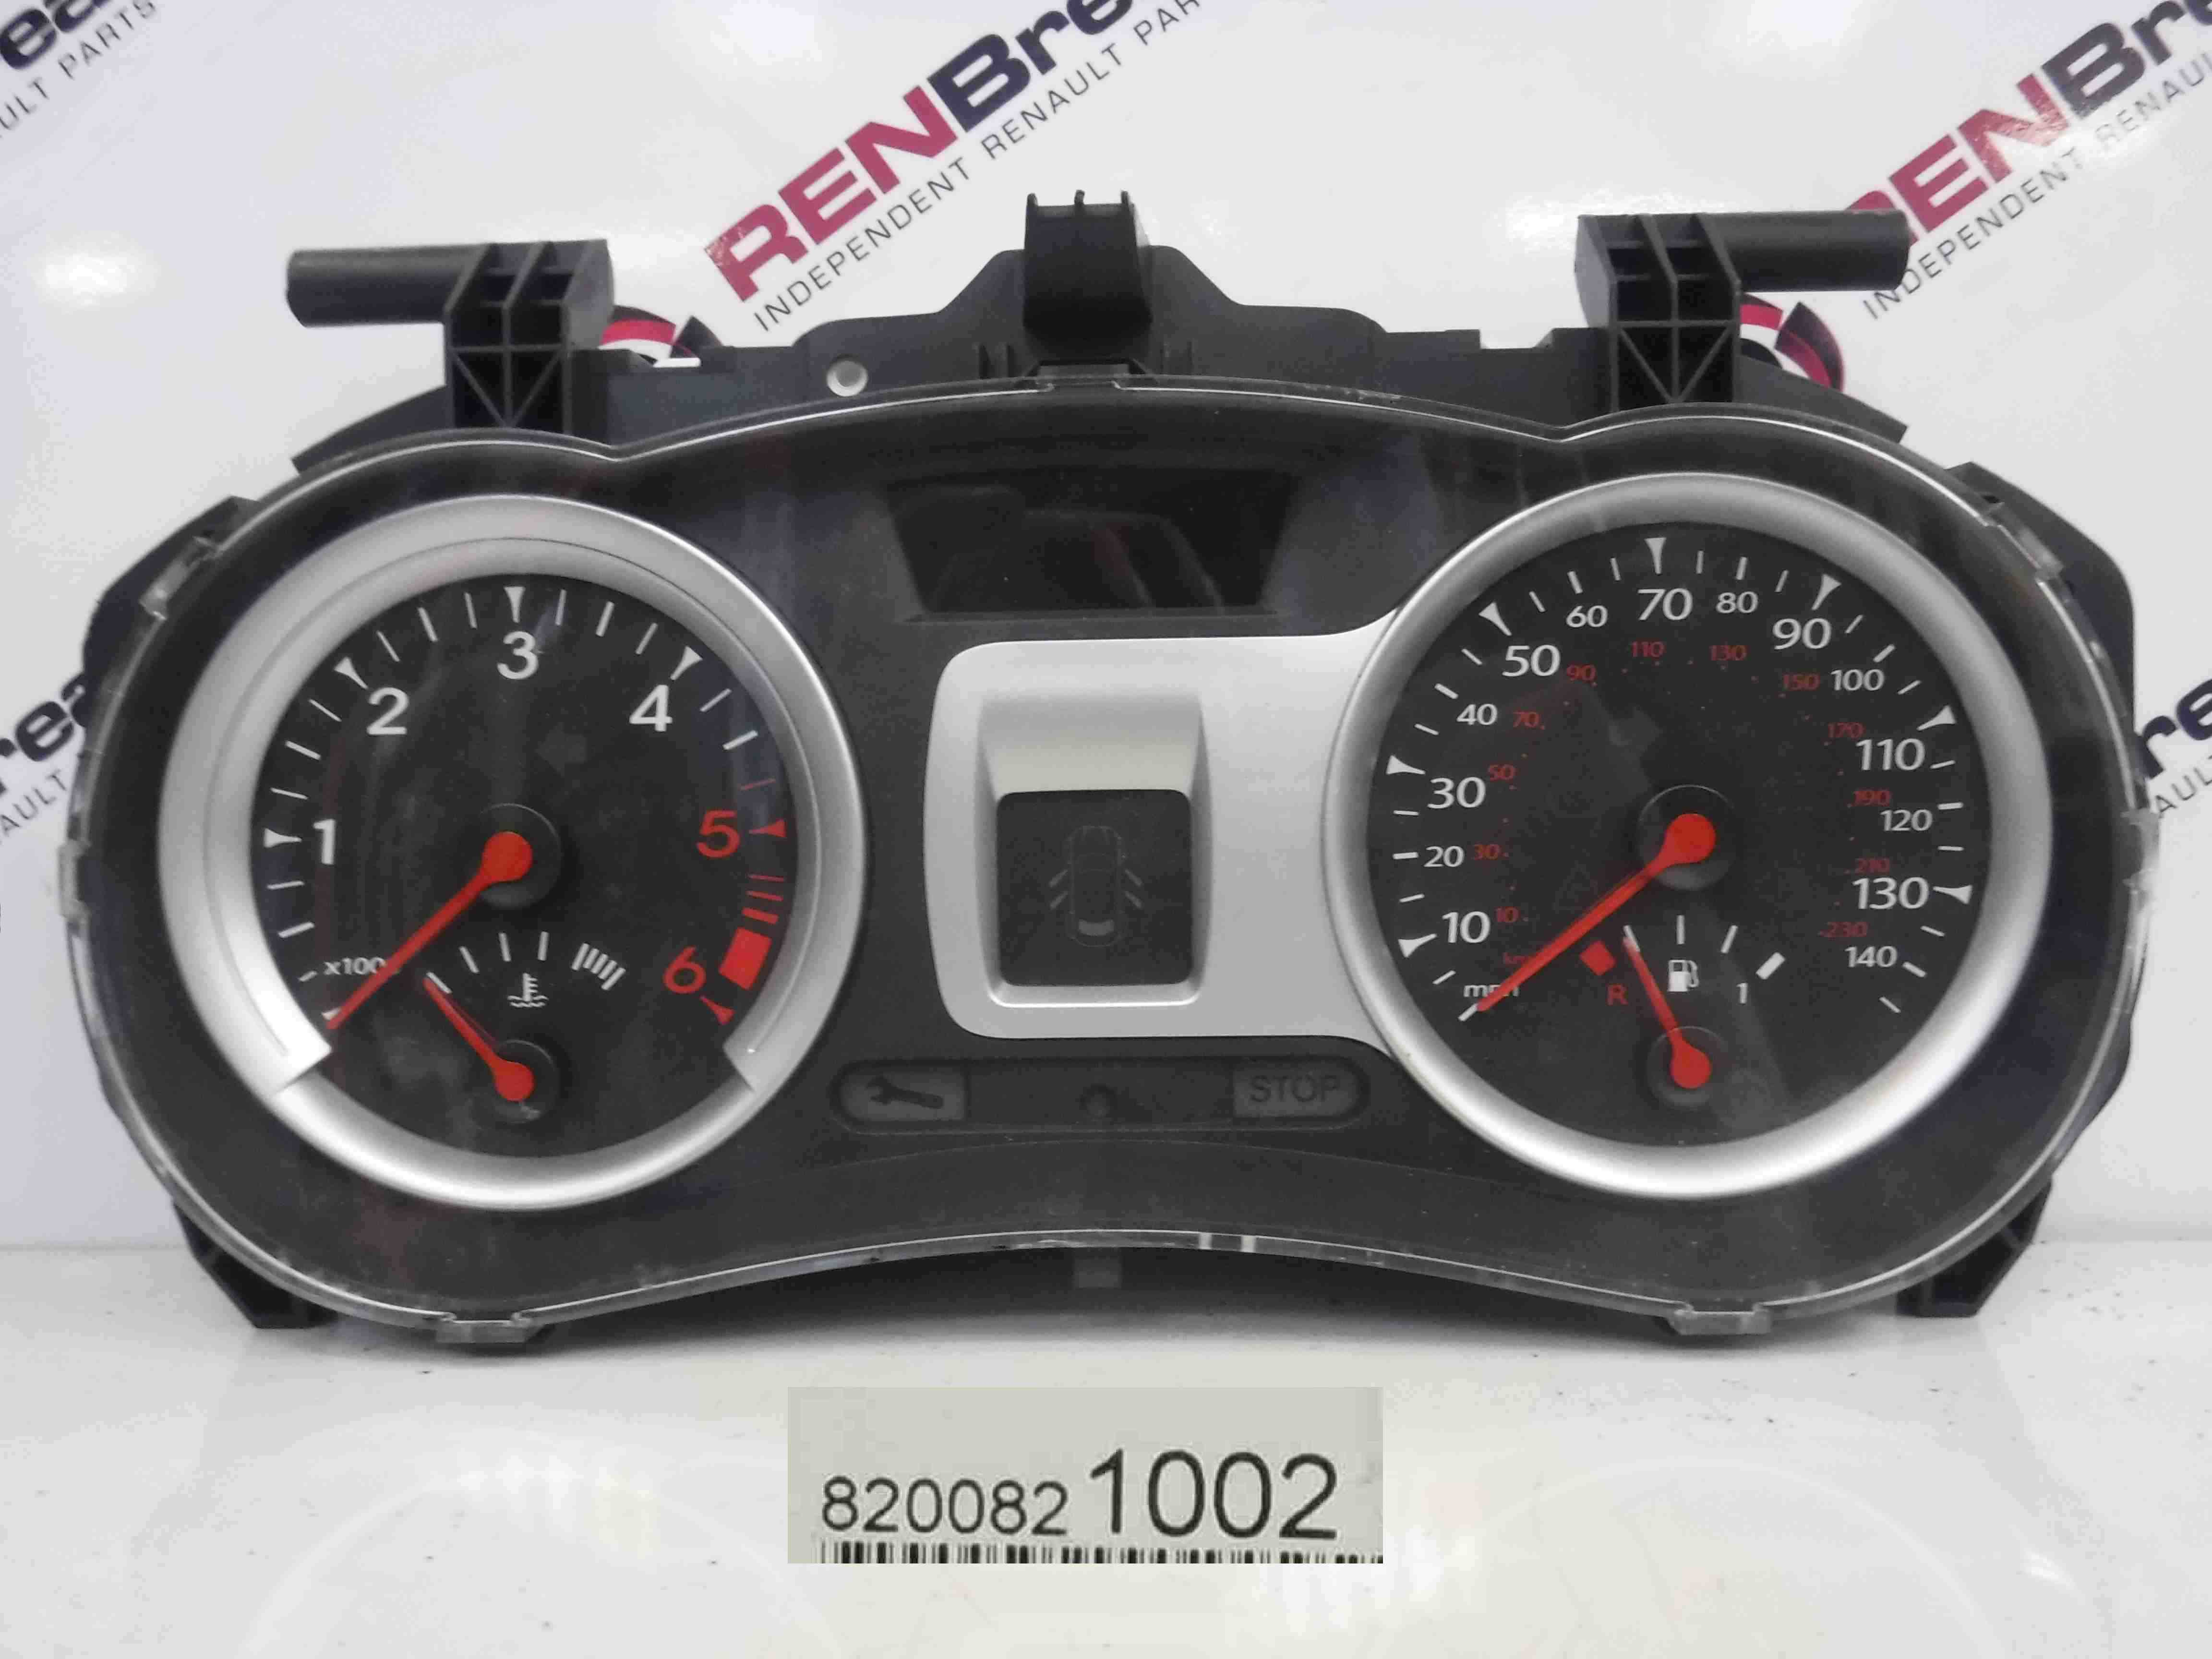 Renault Clio MK3 2009-2012 Instrument Panel Dials Clocks 111K 8200821002